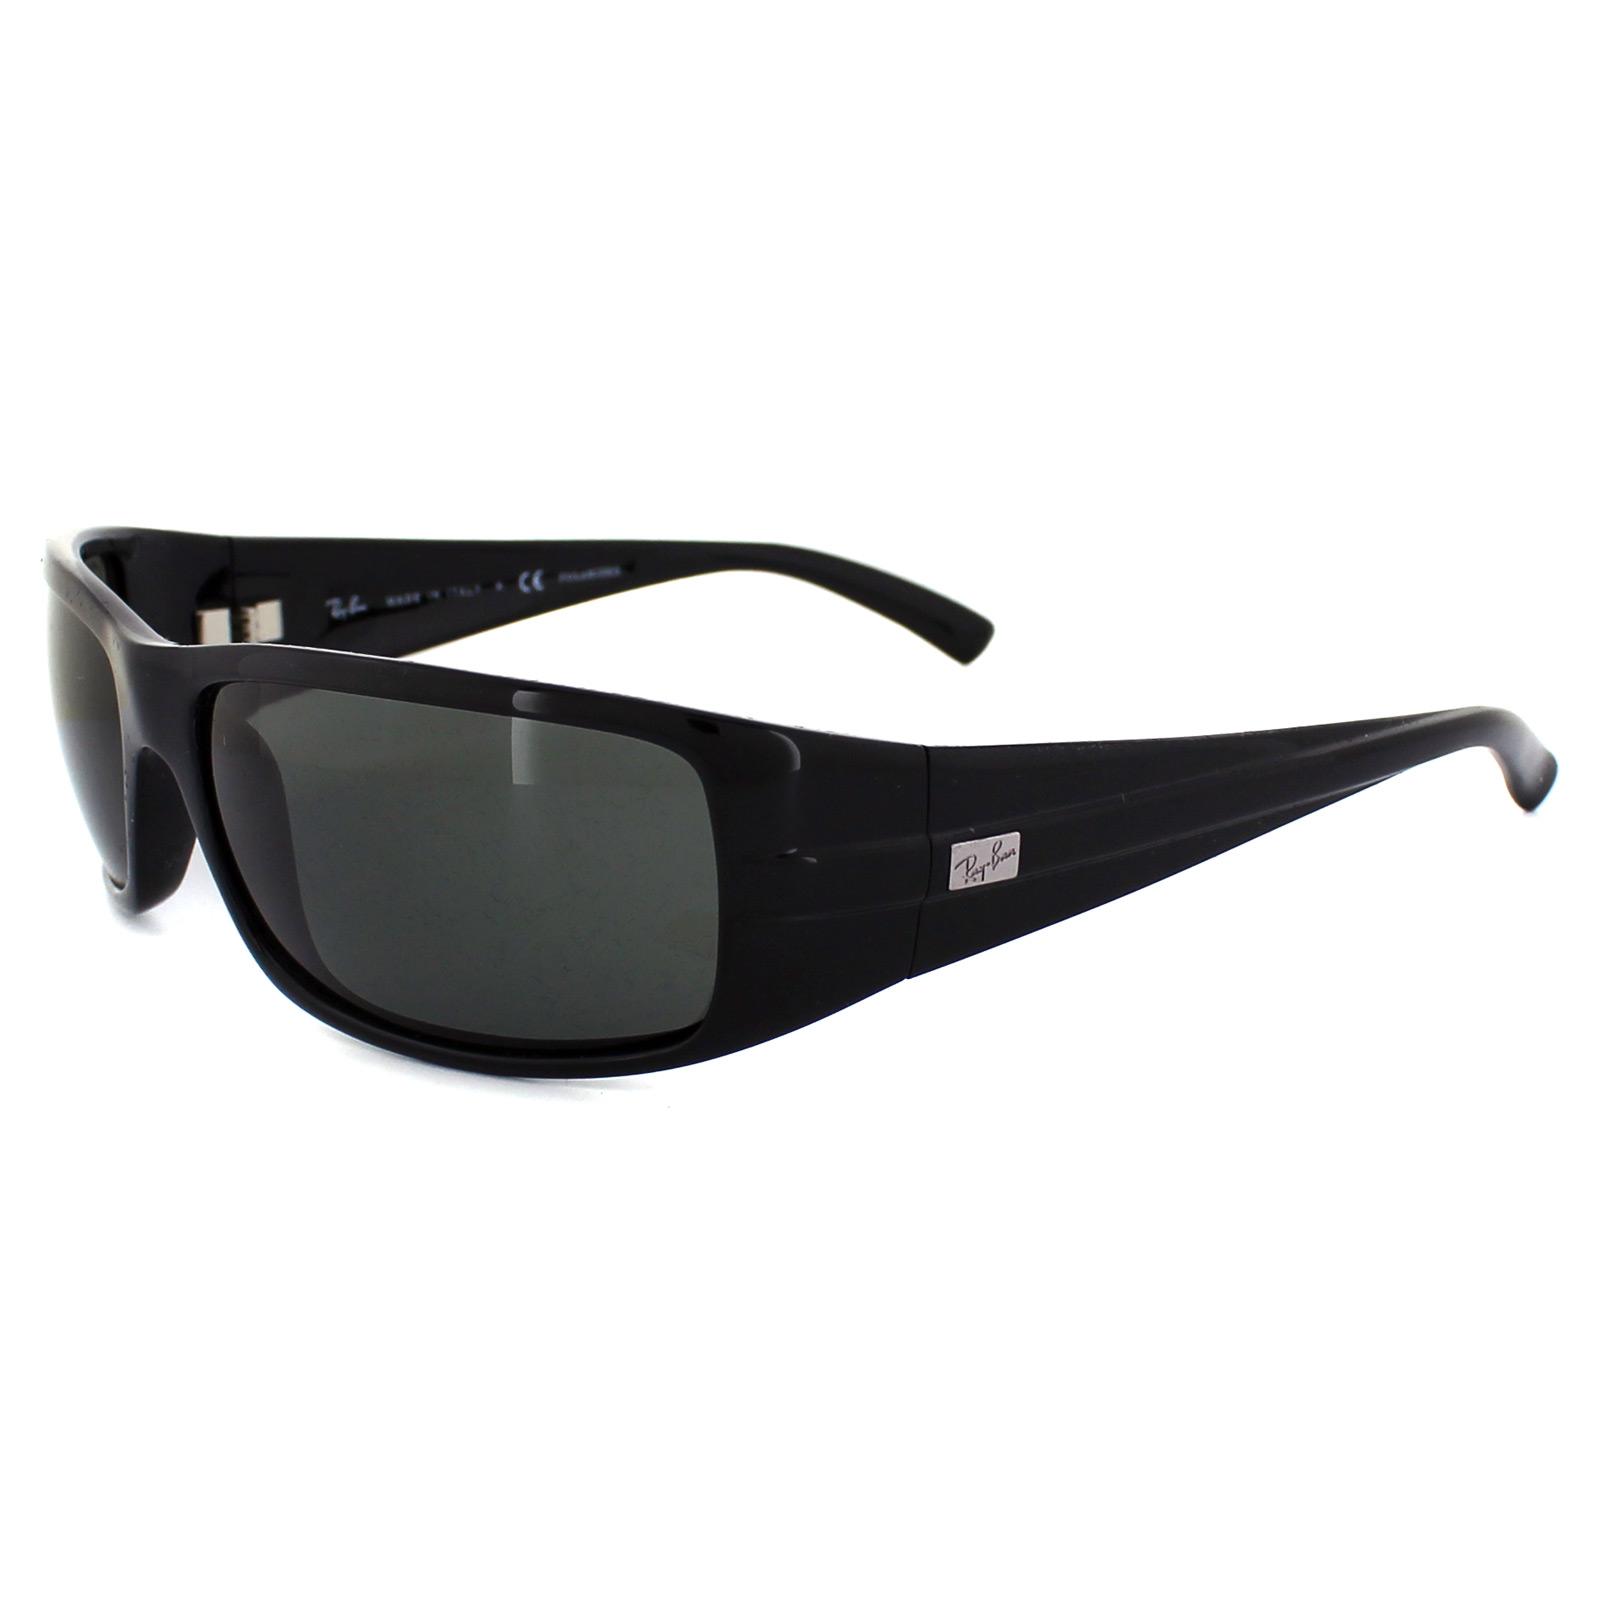 Cheap Rayban Sunglasses 4057 Black Green Polarized 601 58 Discounted Sunglasses